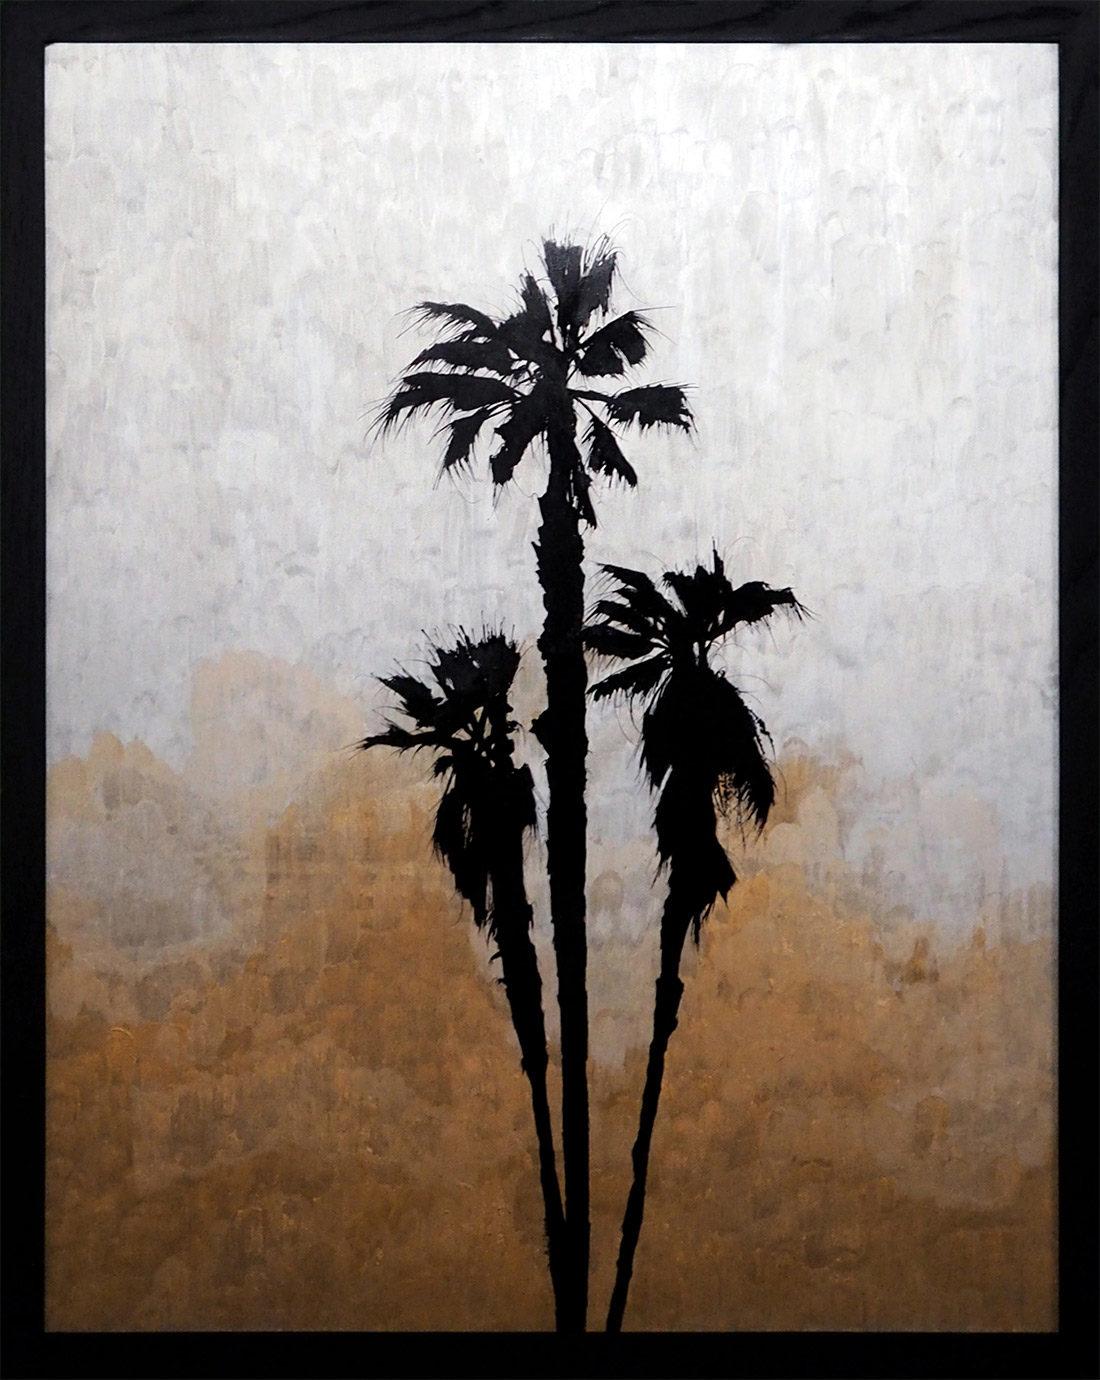 Hubert Jouzeau - Peinture acrylique - Palmtree